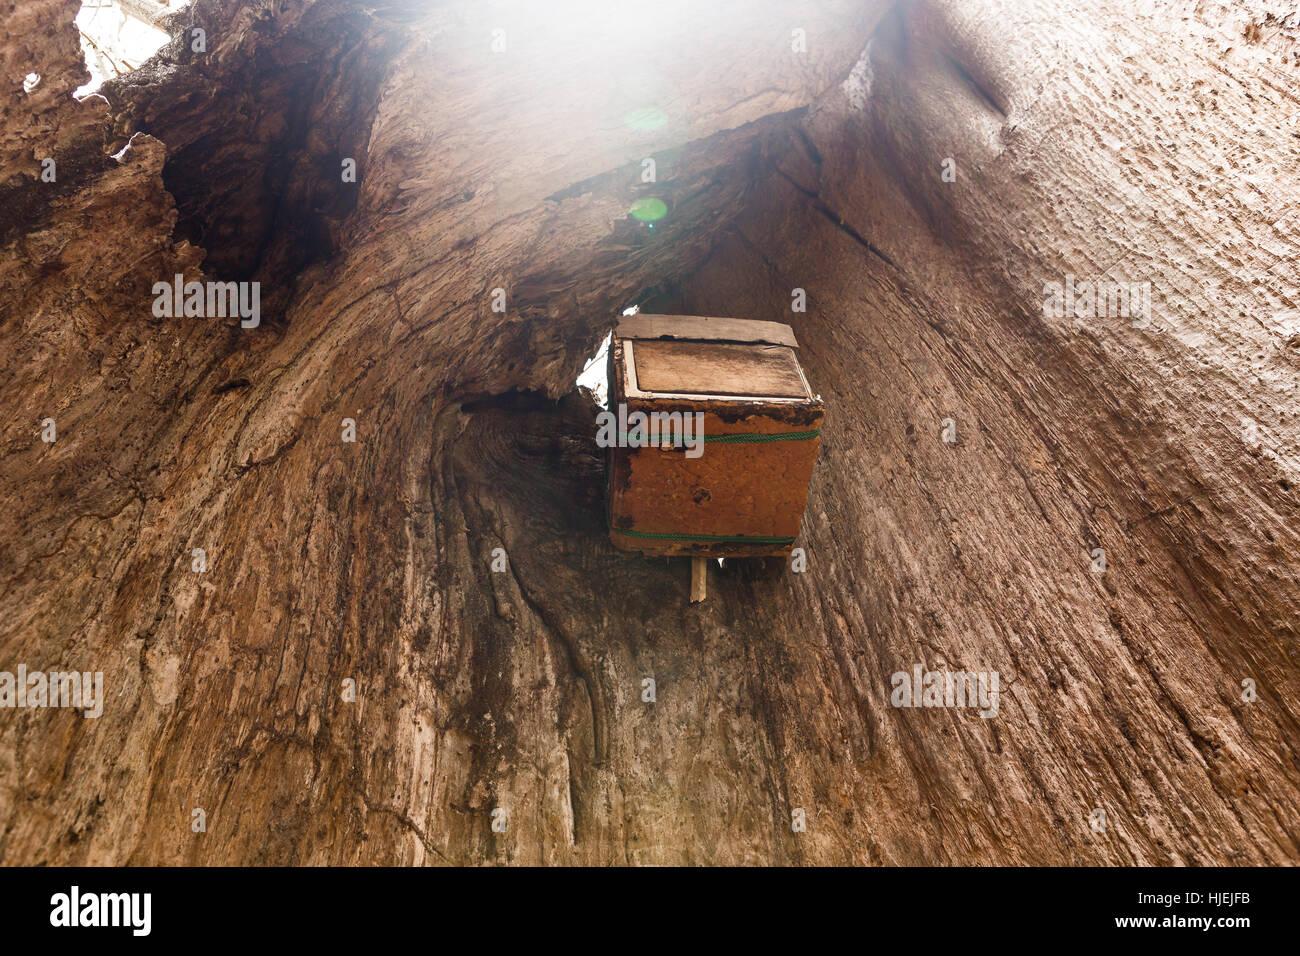 hollow baobab photos hollow baobab images alamy. Black Bedroom Furniture Sets. Home Design Ideas